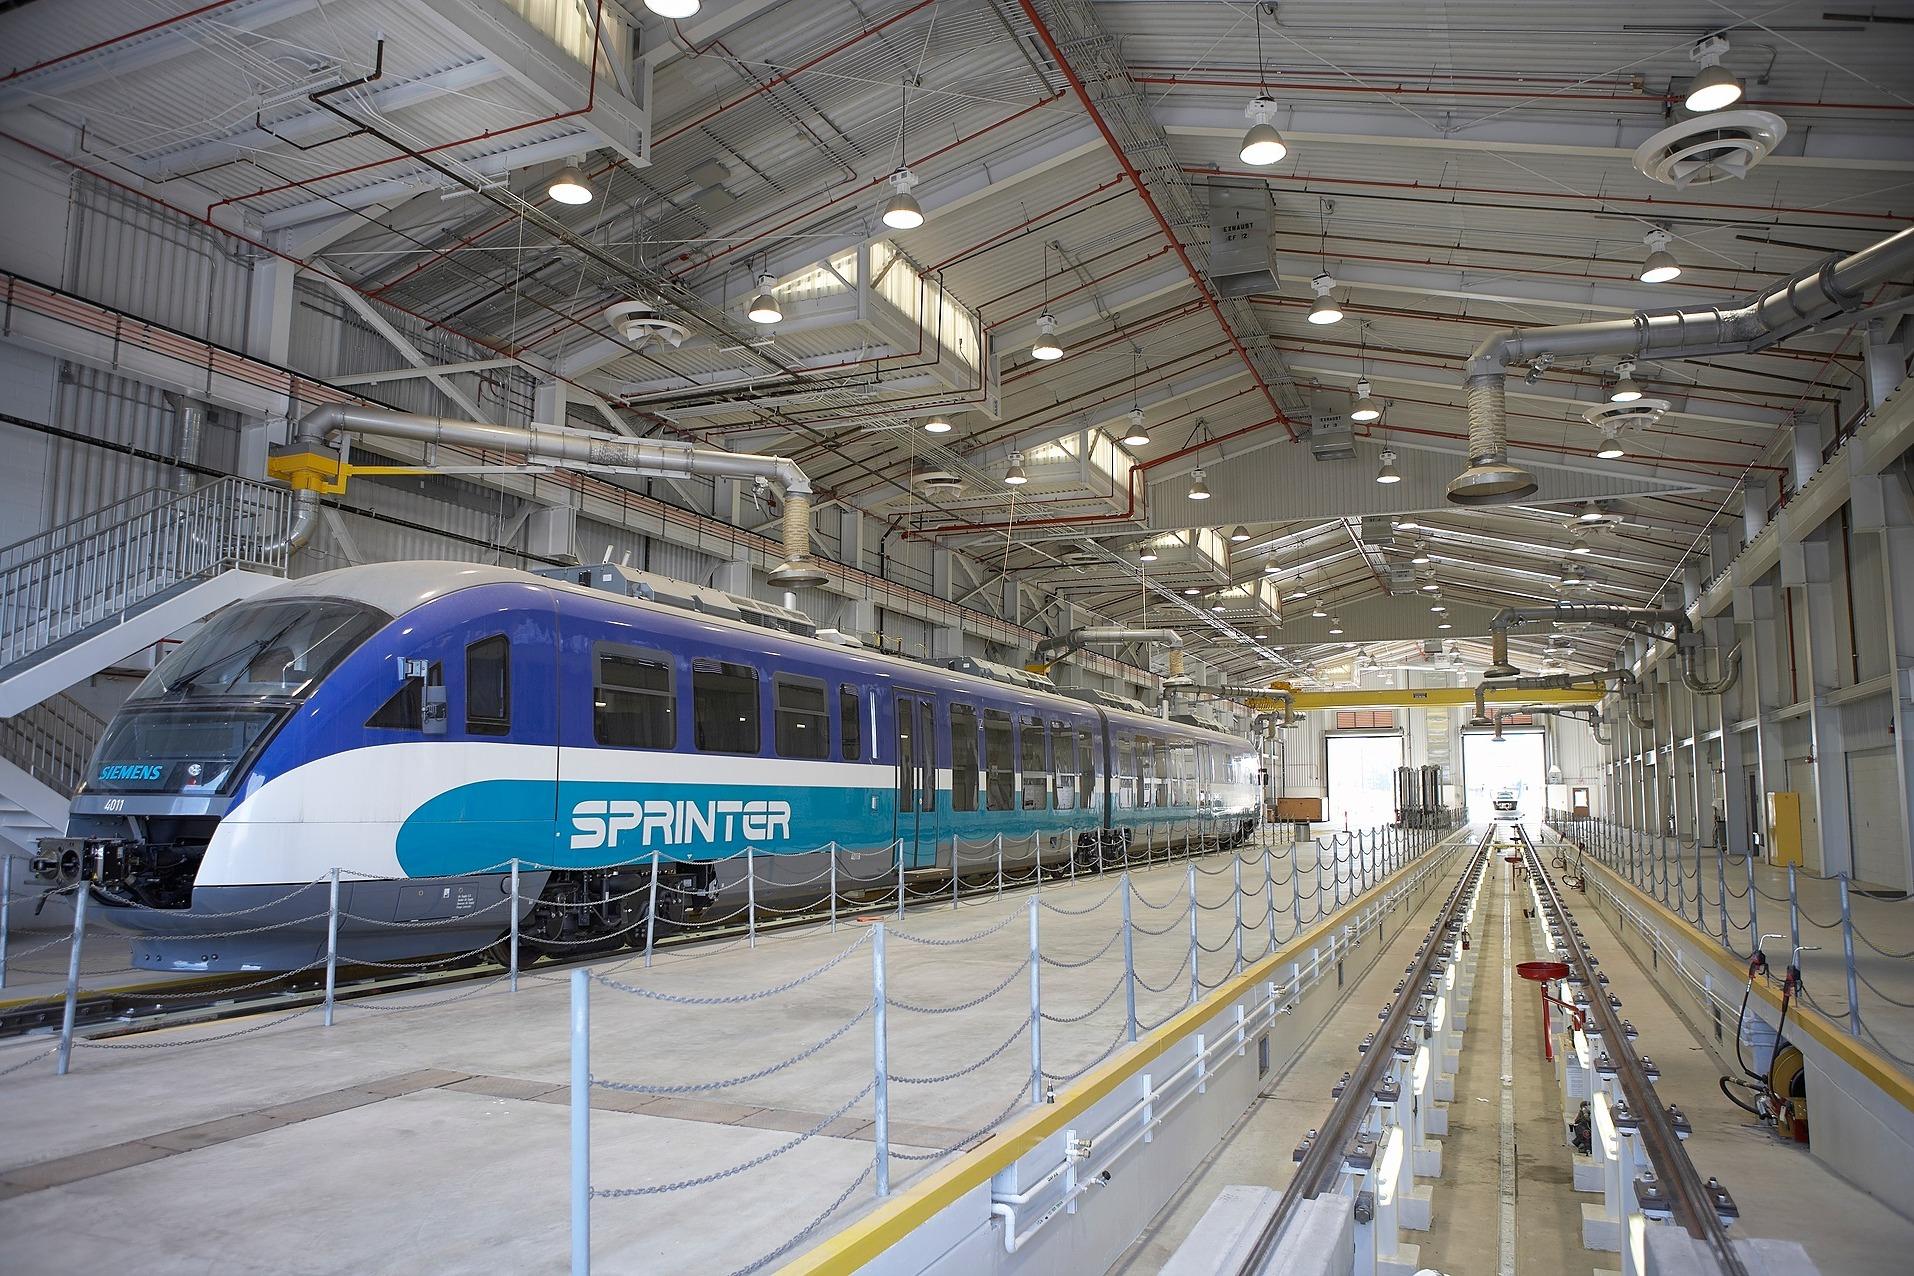 Sprinter Station